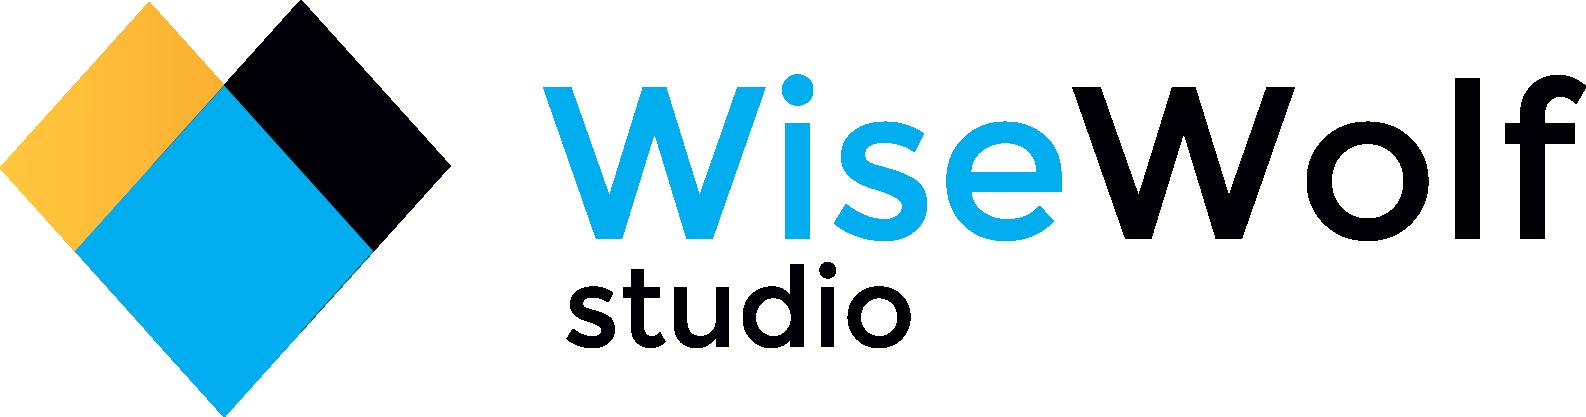 Wise Wolf Studio